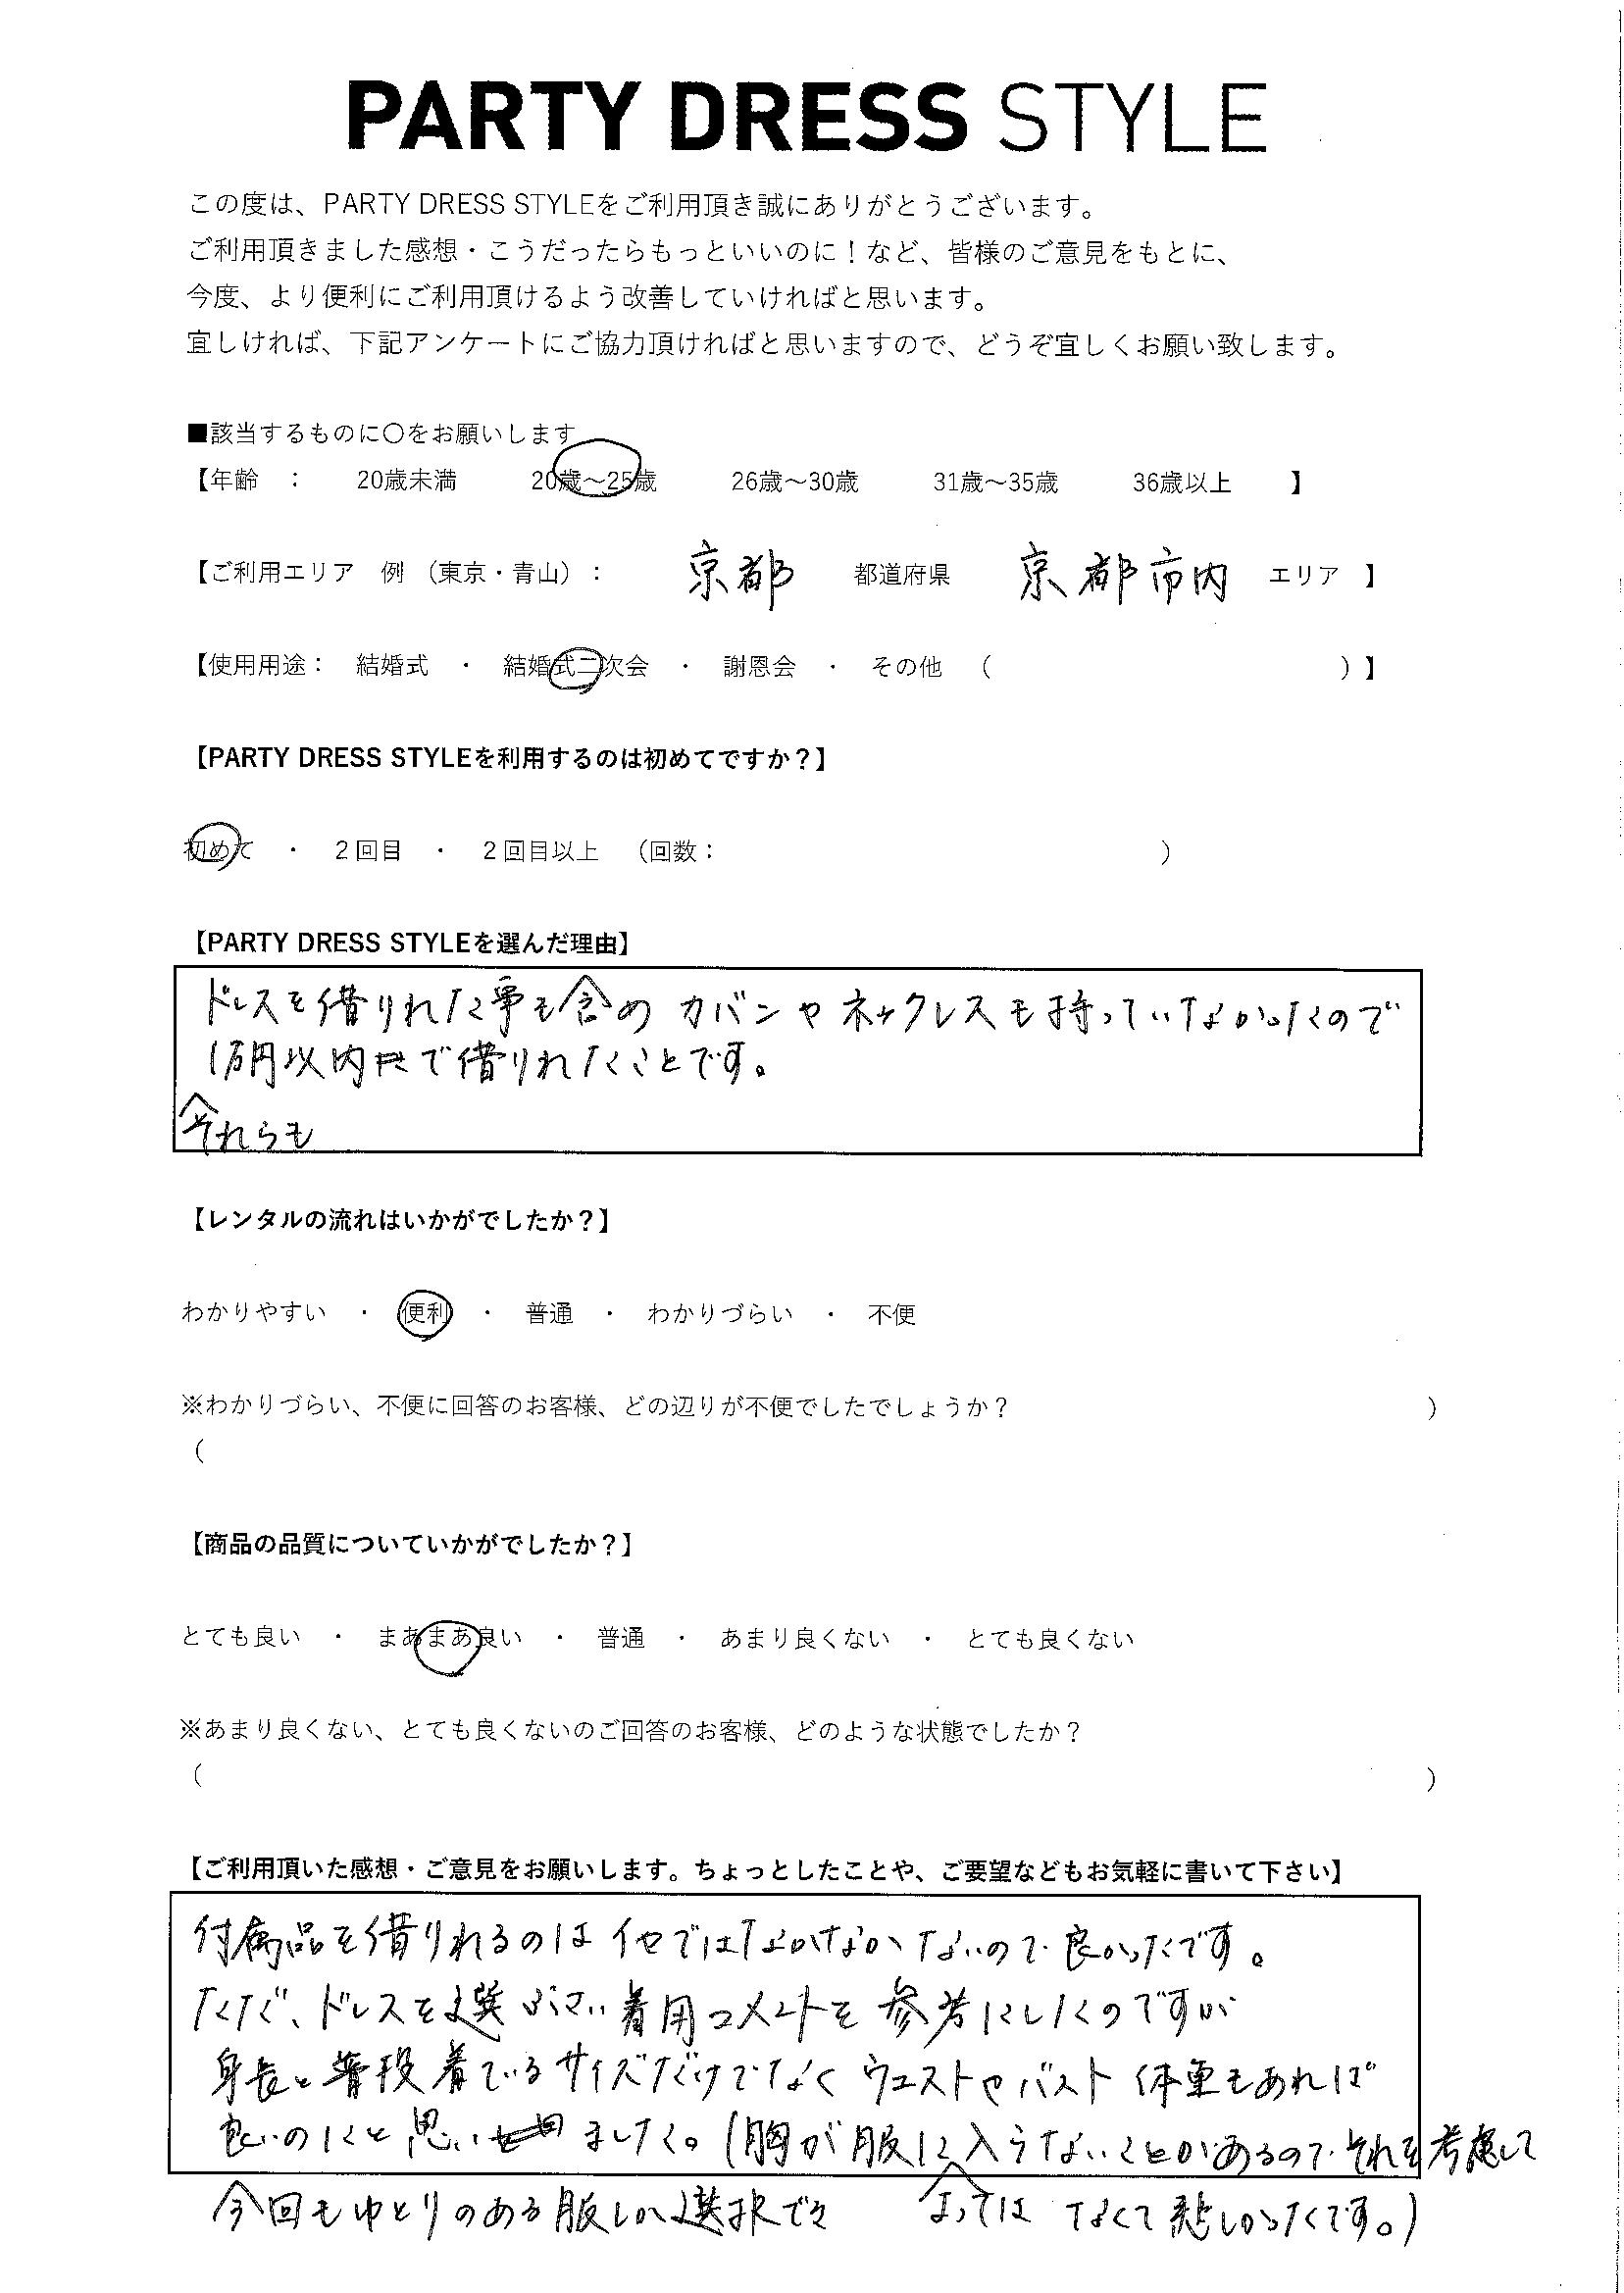 10/5結婚式二次会 京都府・京都市エリア